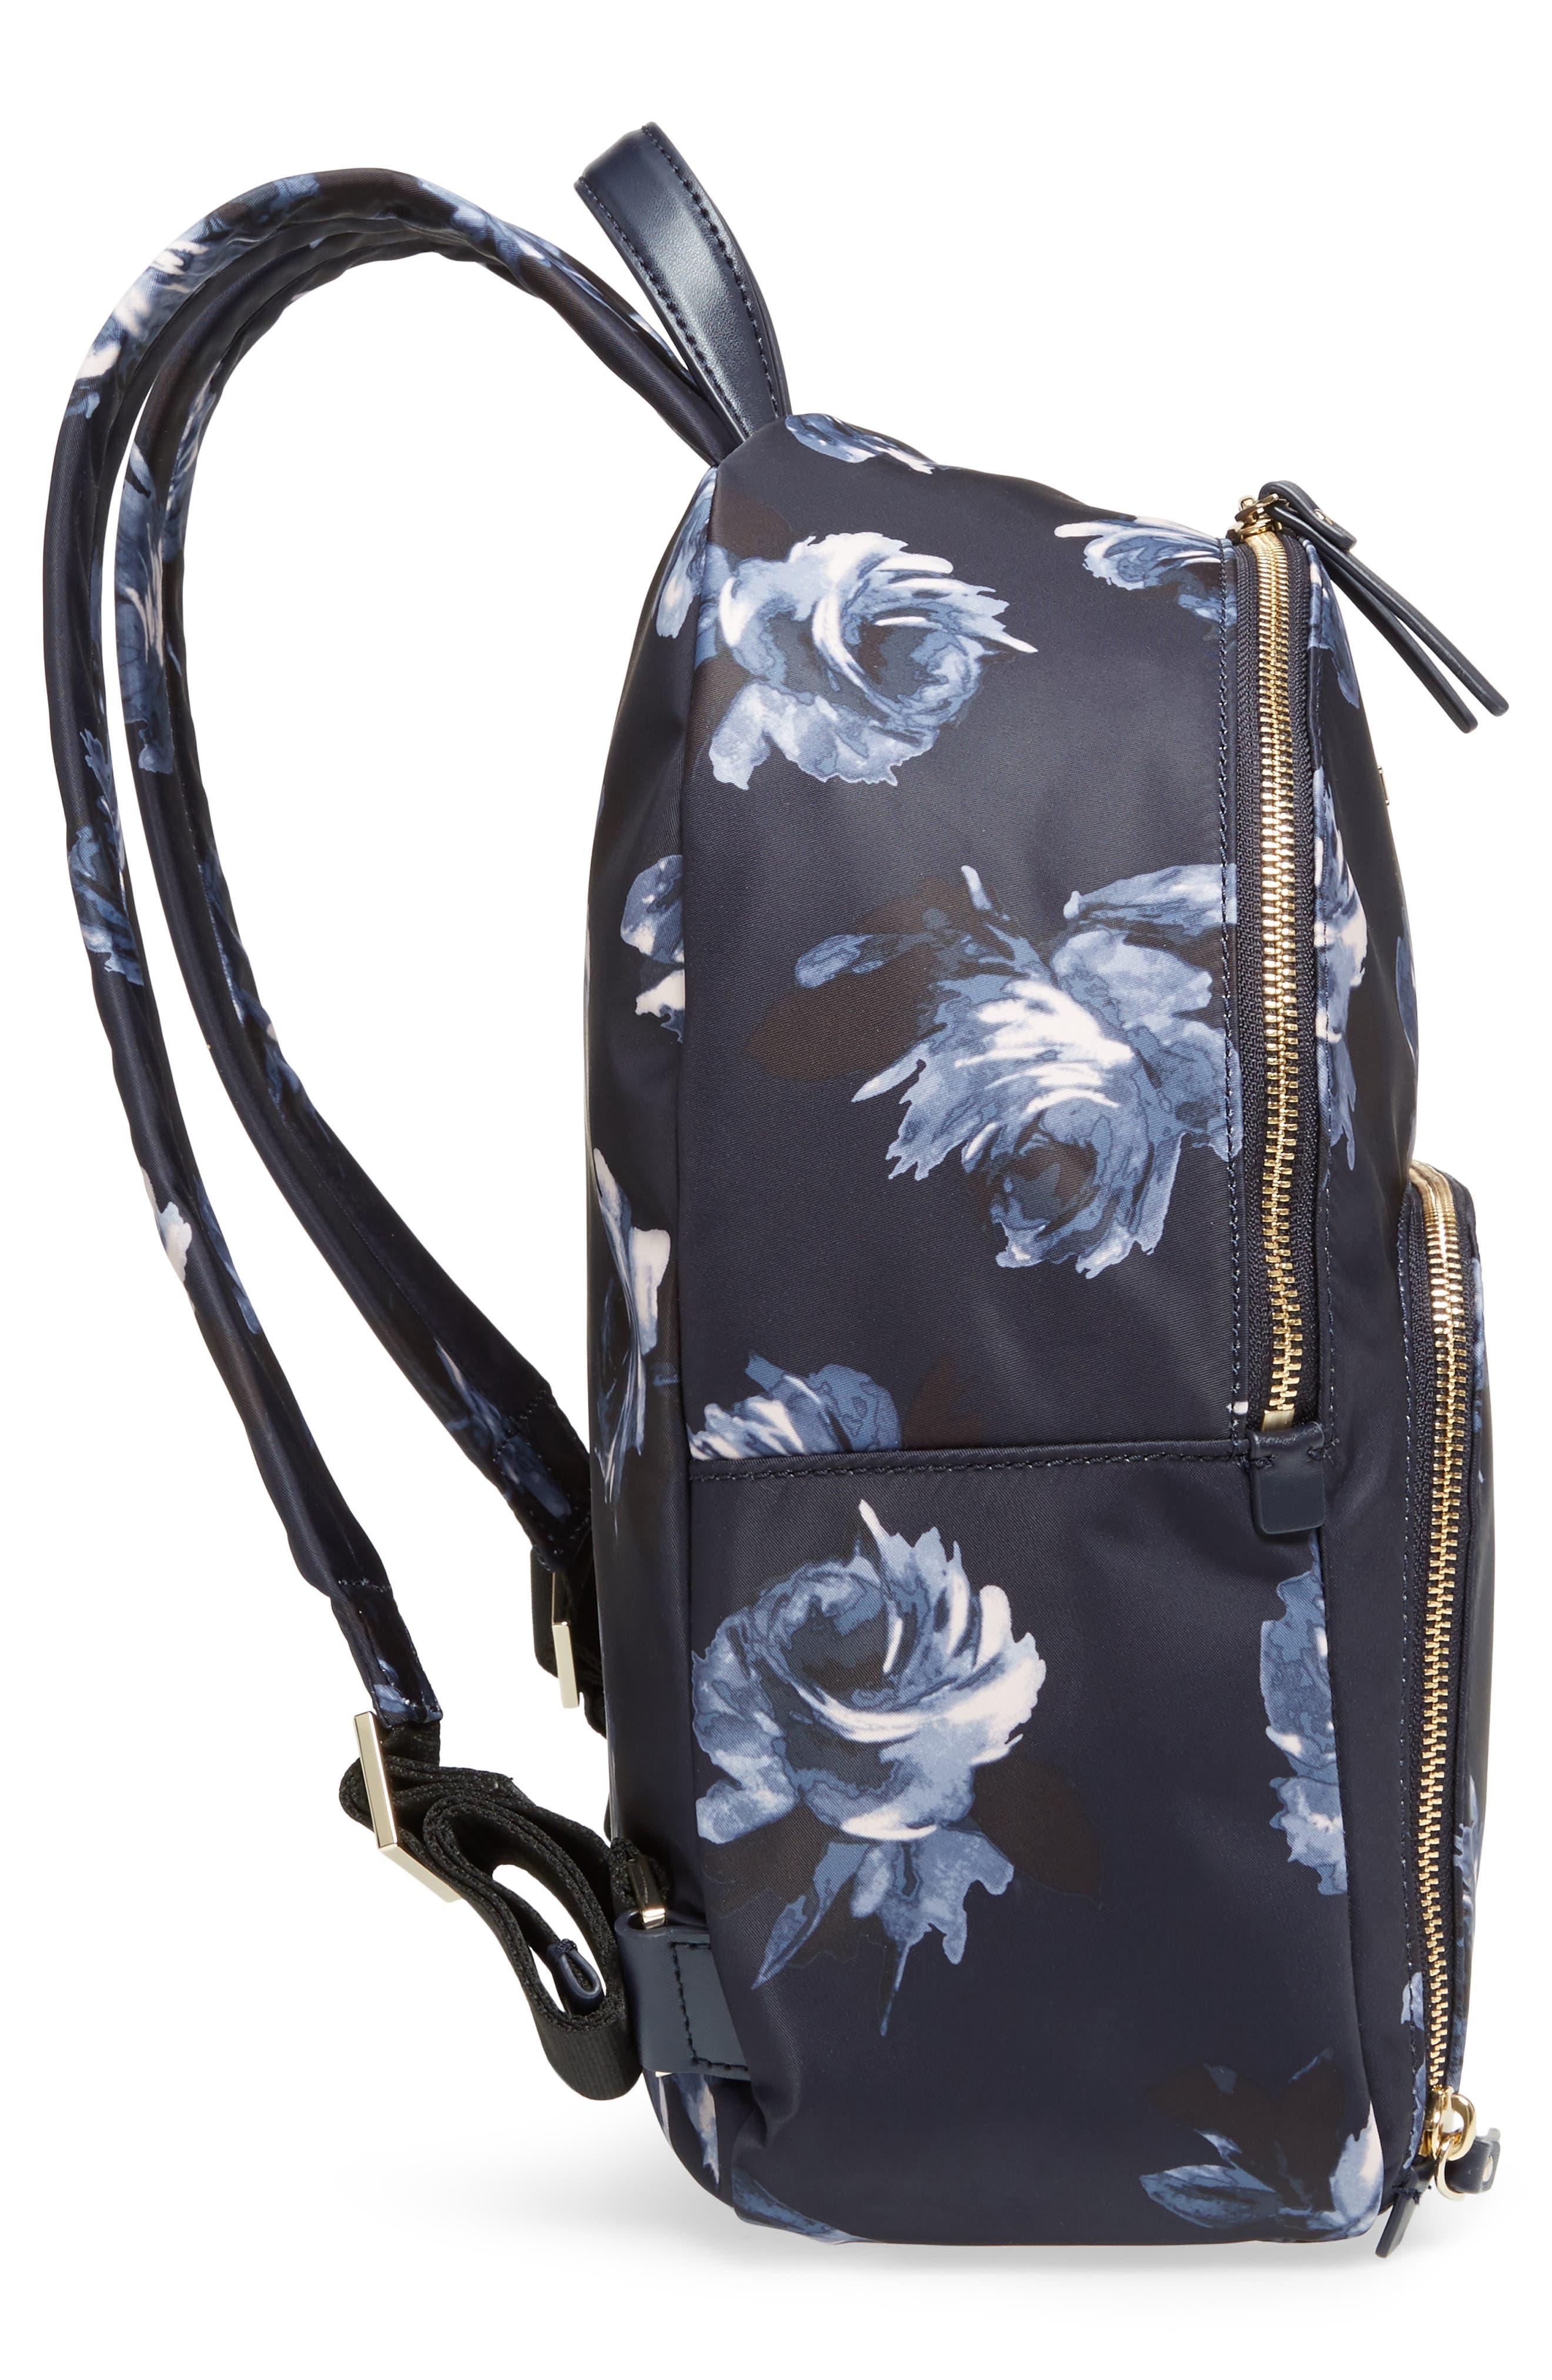 watson lane night rose hartley nylon backpack,                             Alternate thumbnail 5, color,                             Night Rose